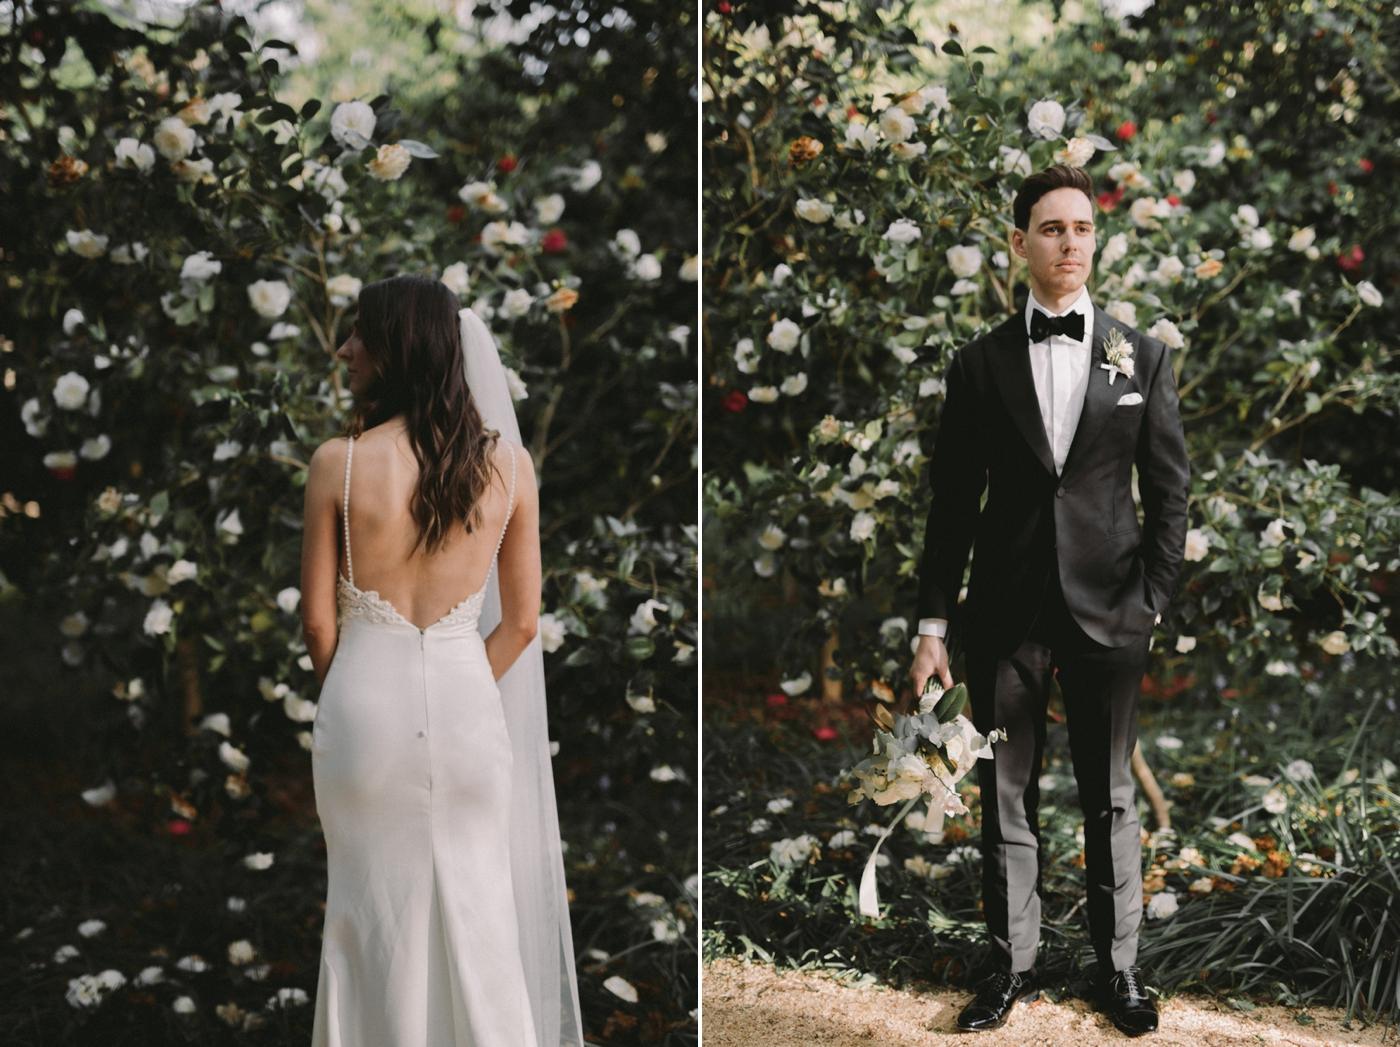 Katie and Ben - Natural Wedding Photography in Adelaide - Beautiful, Candid Wedding Photographer - Adelaide Hills Wedding - Katherine Schultz - www.katherineschultzphotography.com_0049.jpg